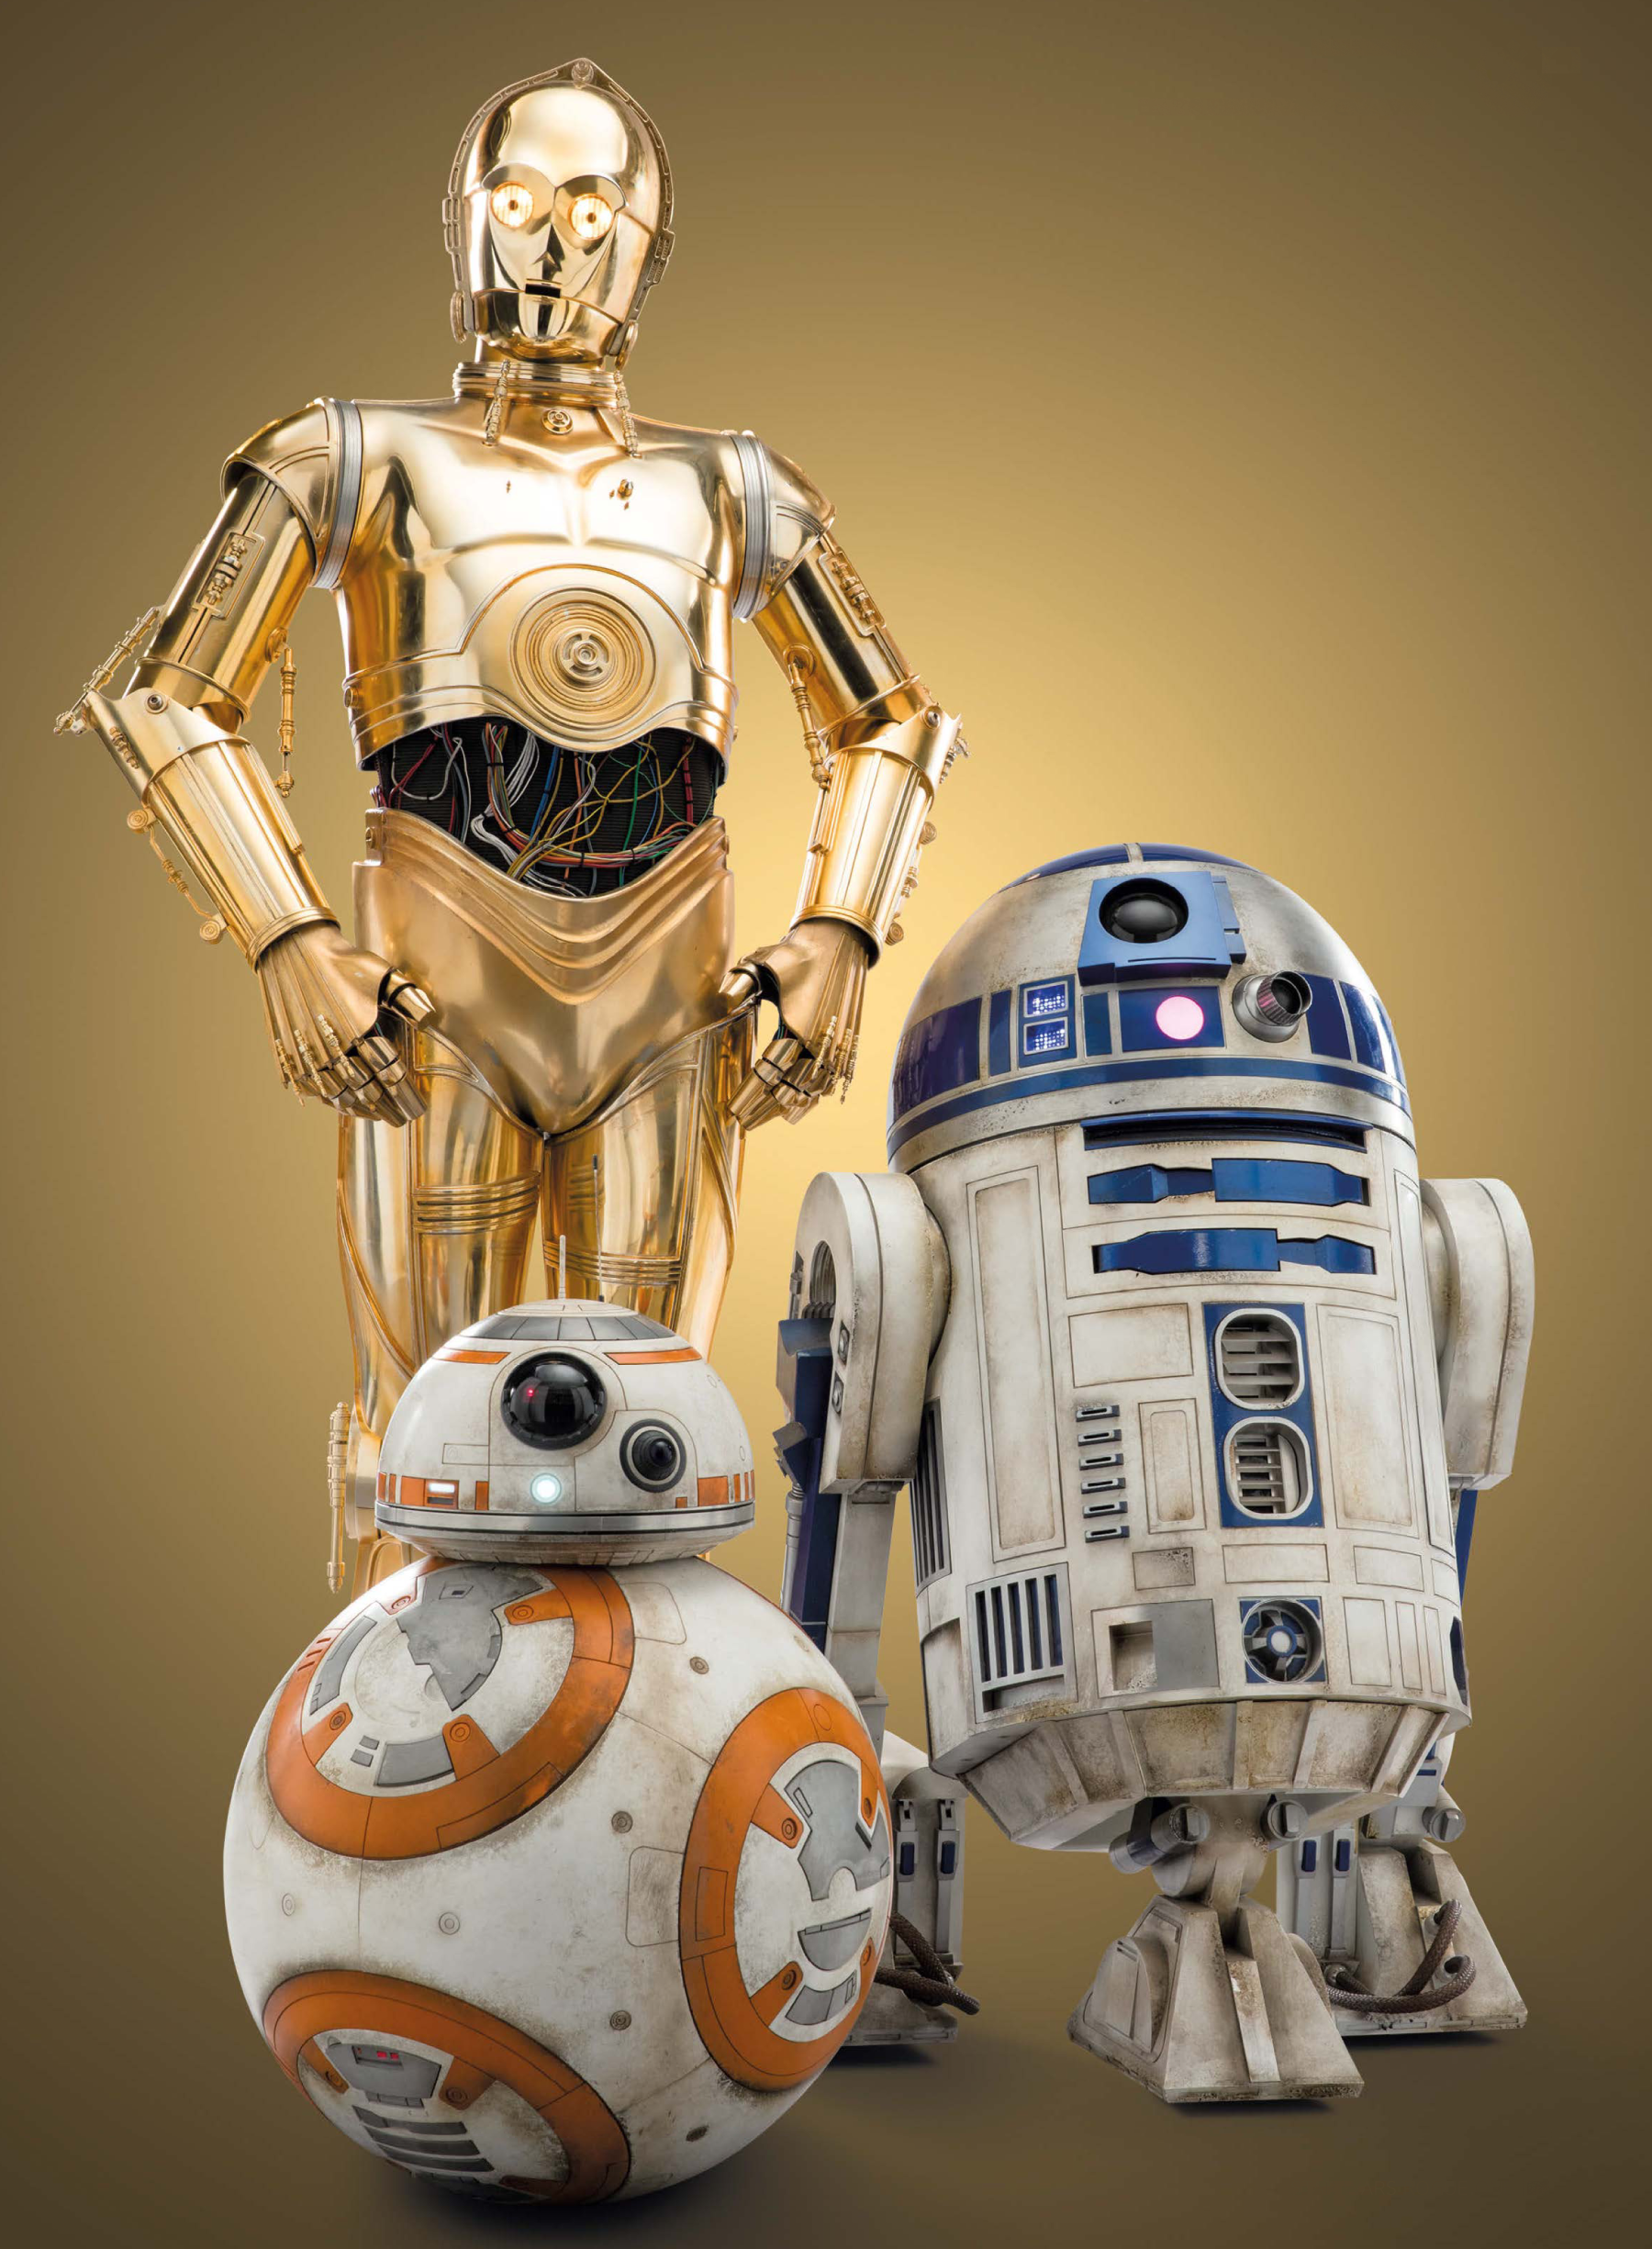 Pin By Susanne Geiger On Star Wars Star Wars Painting Star Wars Poster Star Wars Bb8